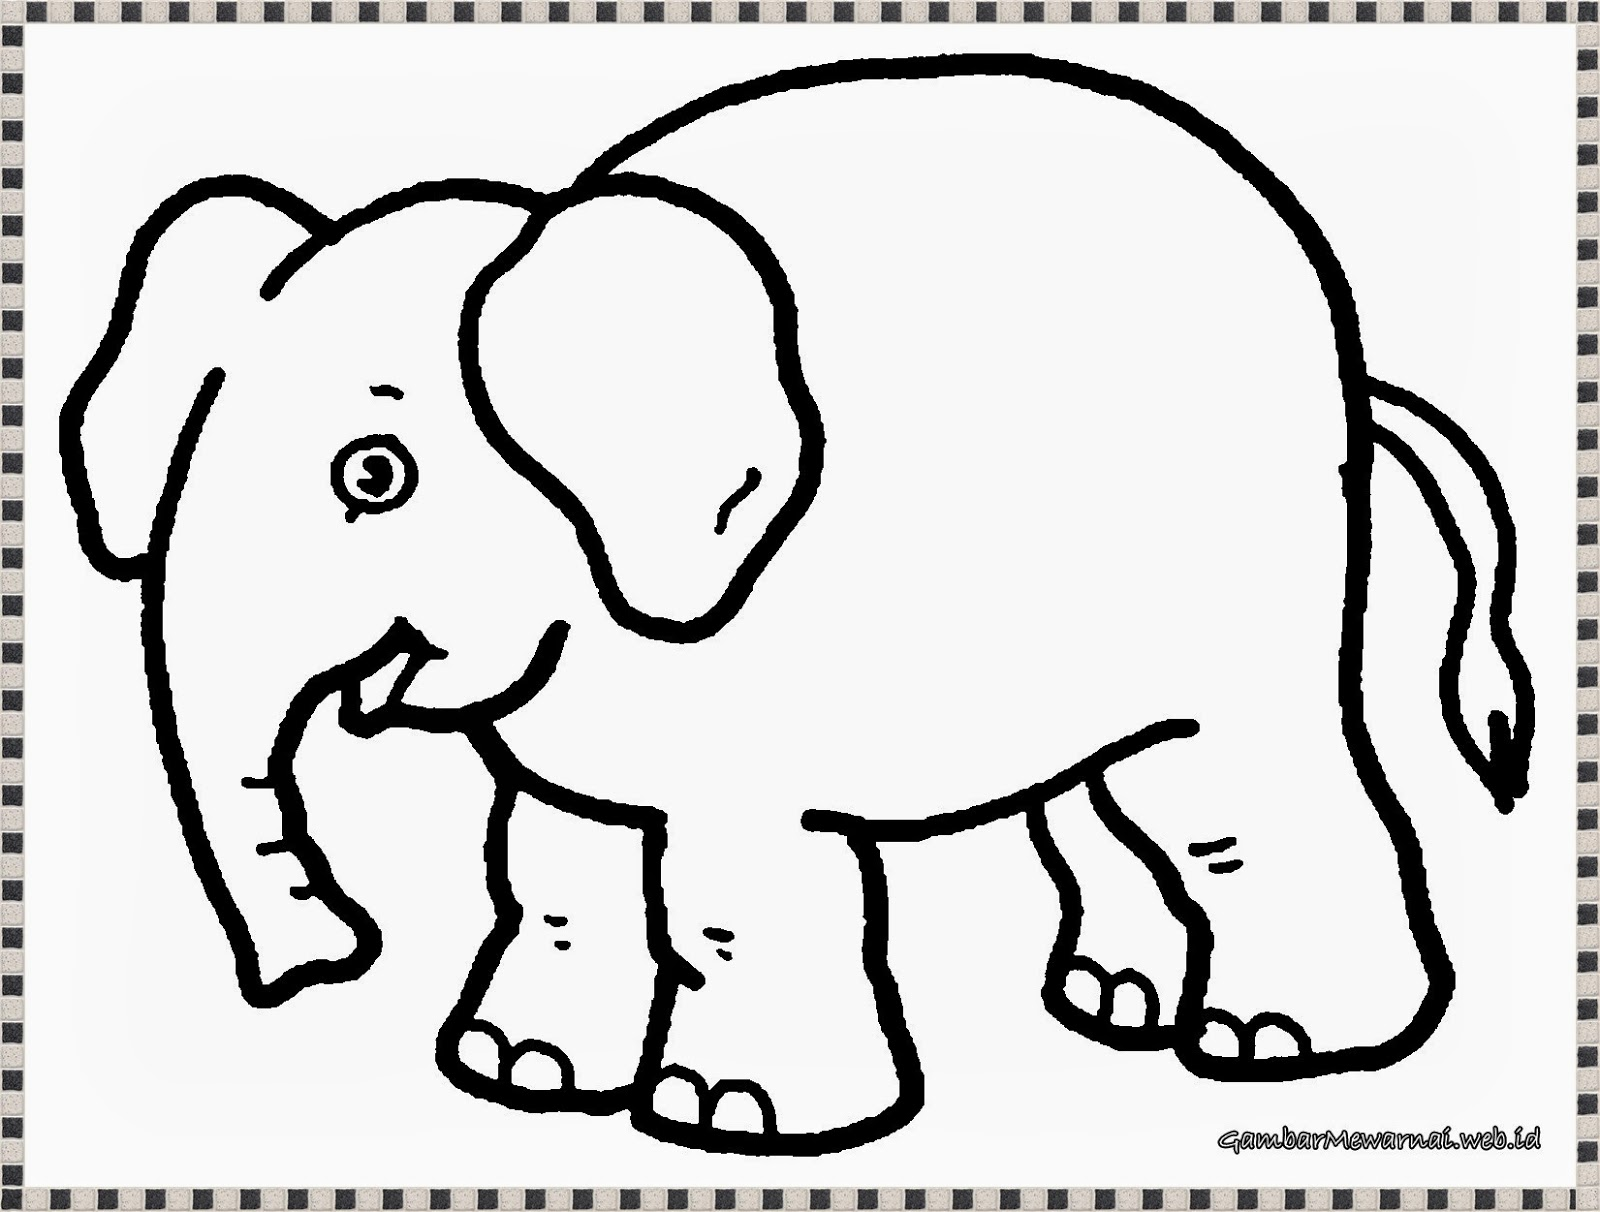 Gambar Mewarnai: Gambar Mewarnai Gajah - GambarMewarnai.Web.Id